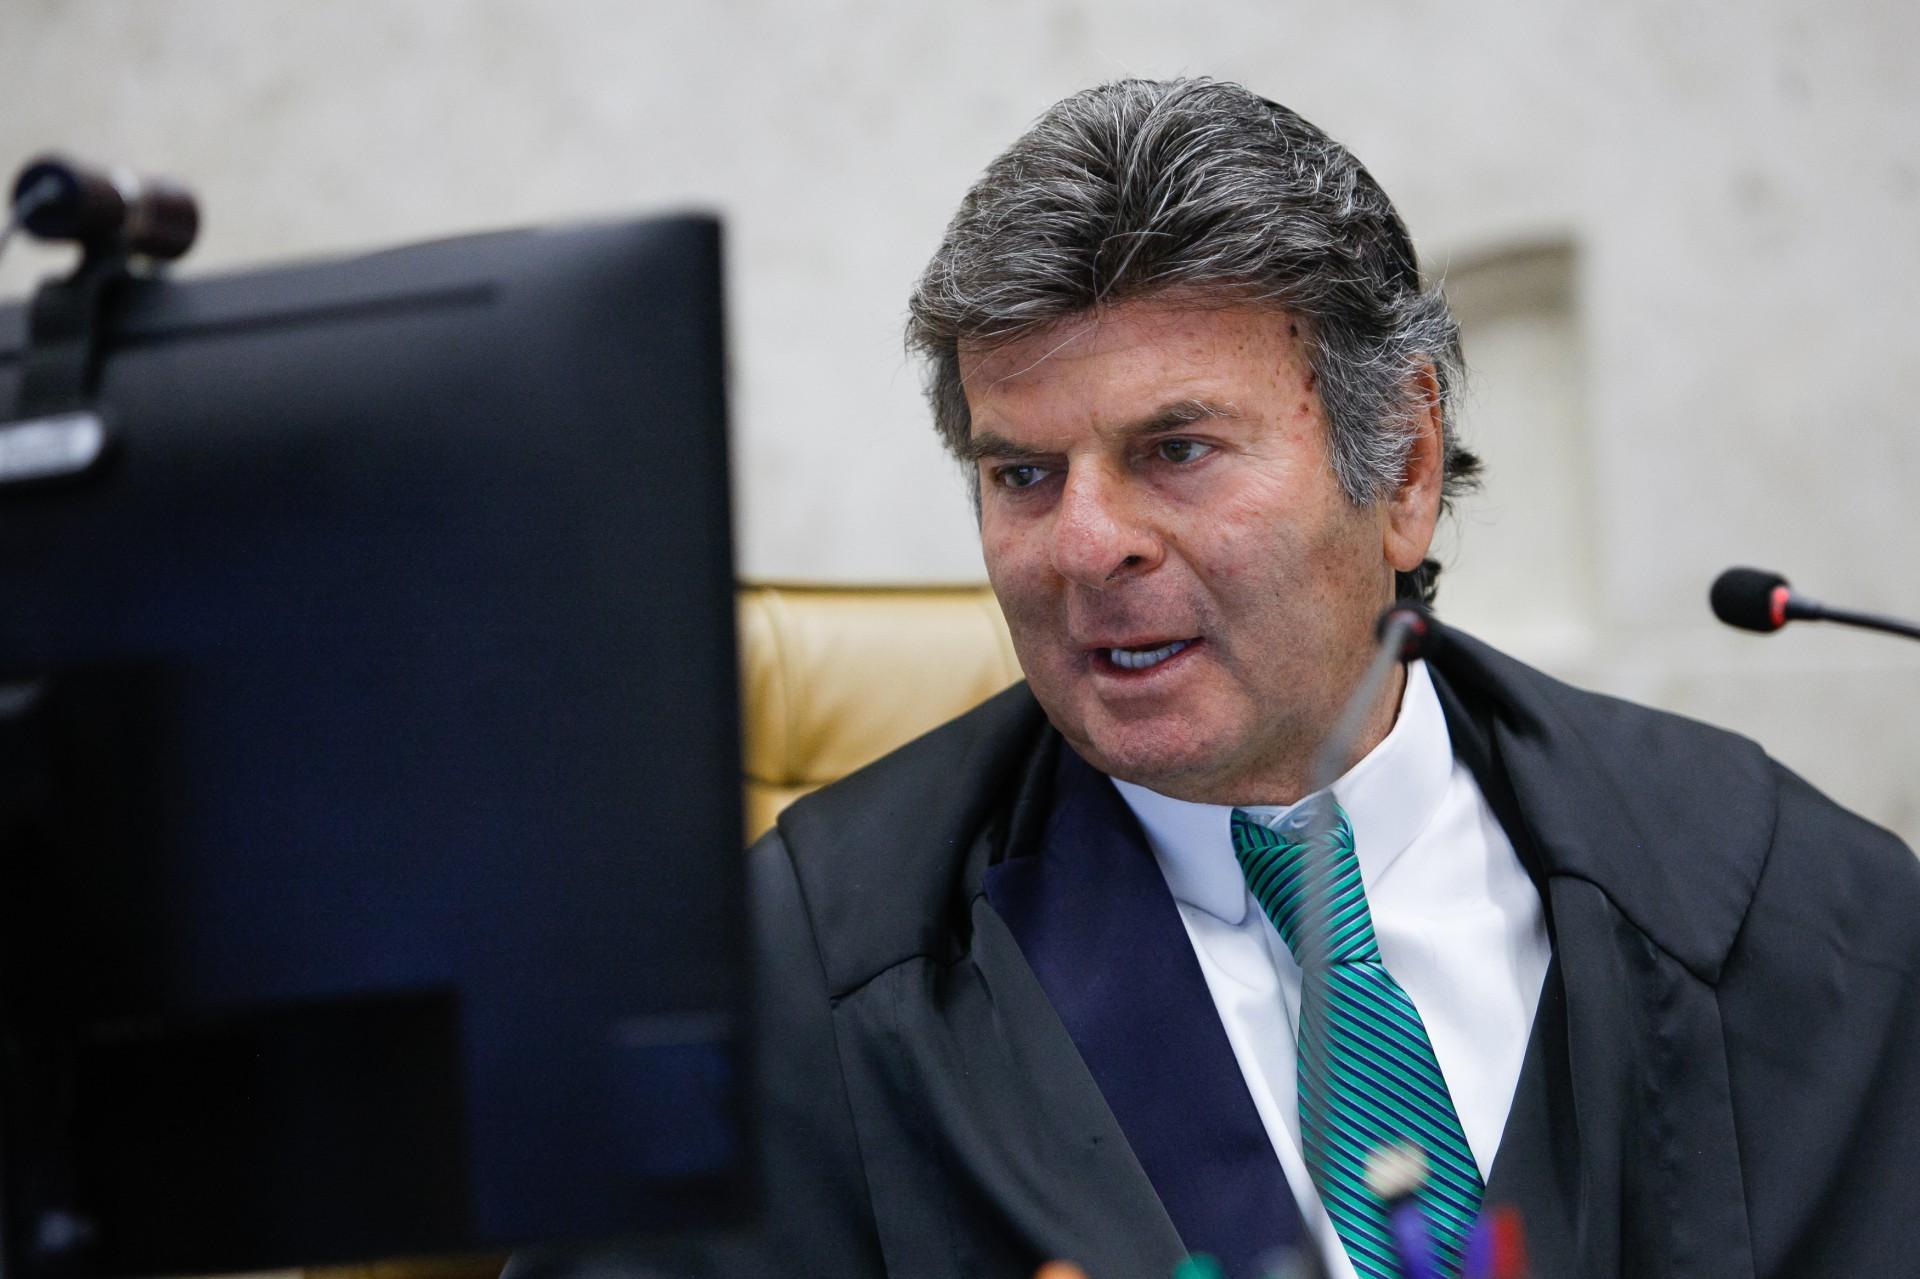 PRESIDENTE do STF, Luiz Fux propôs a reunião desta quarta (Foto: Fellipe Sampaio /SCO/STF)